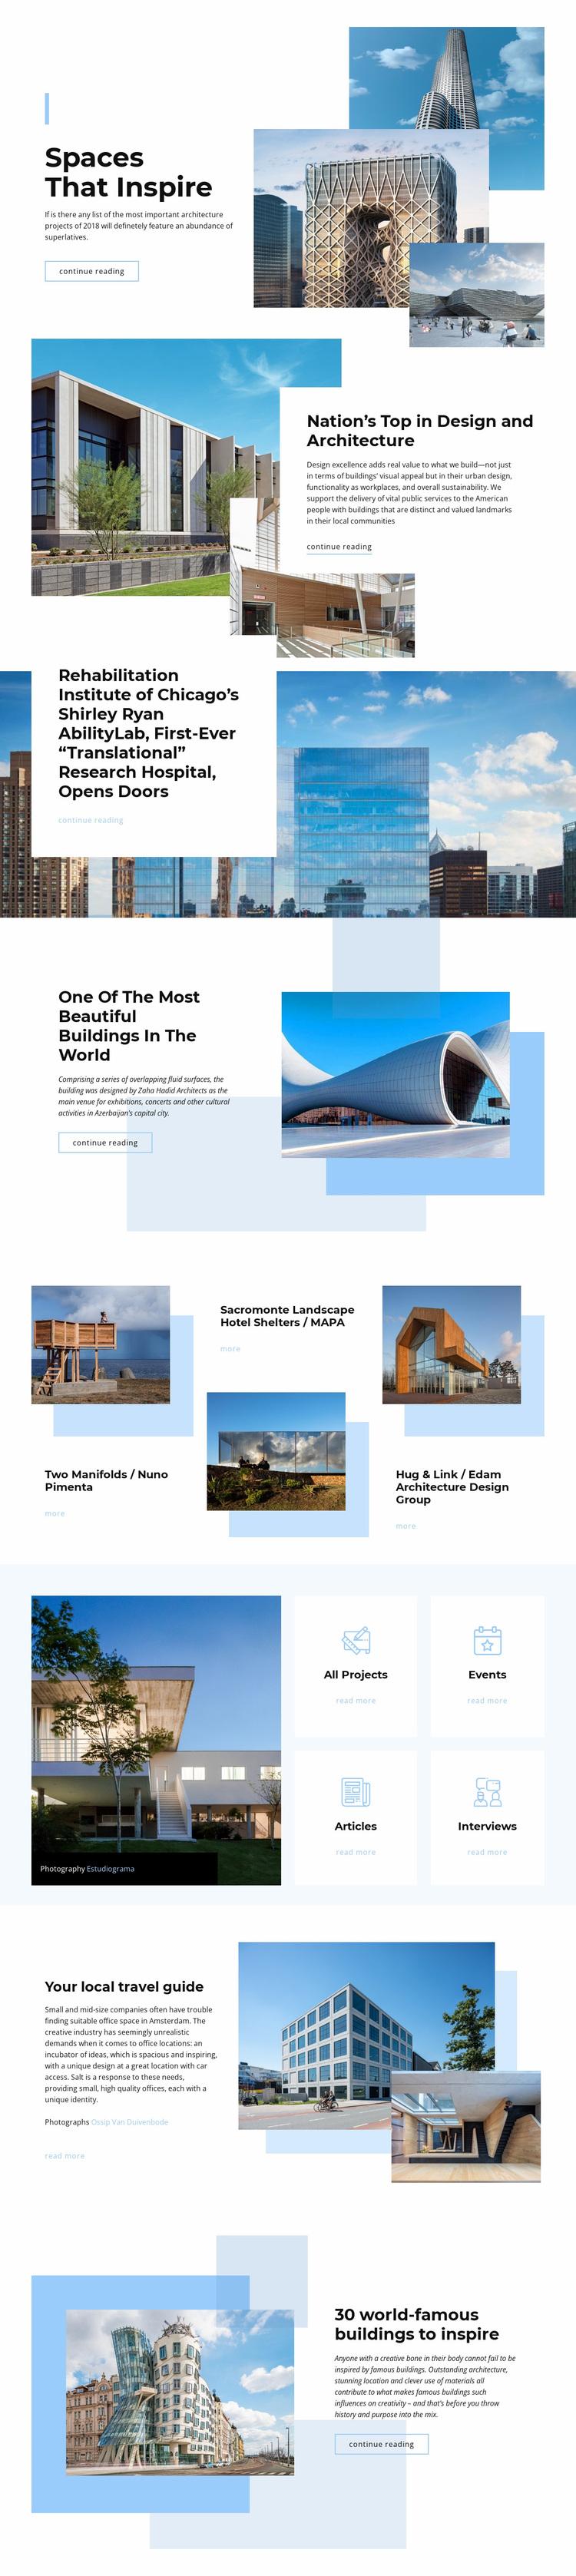 Spaces That Inspire Website Design